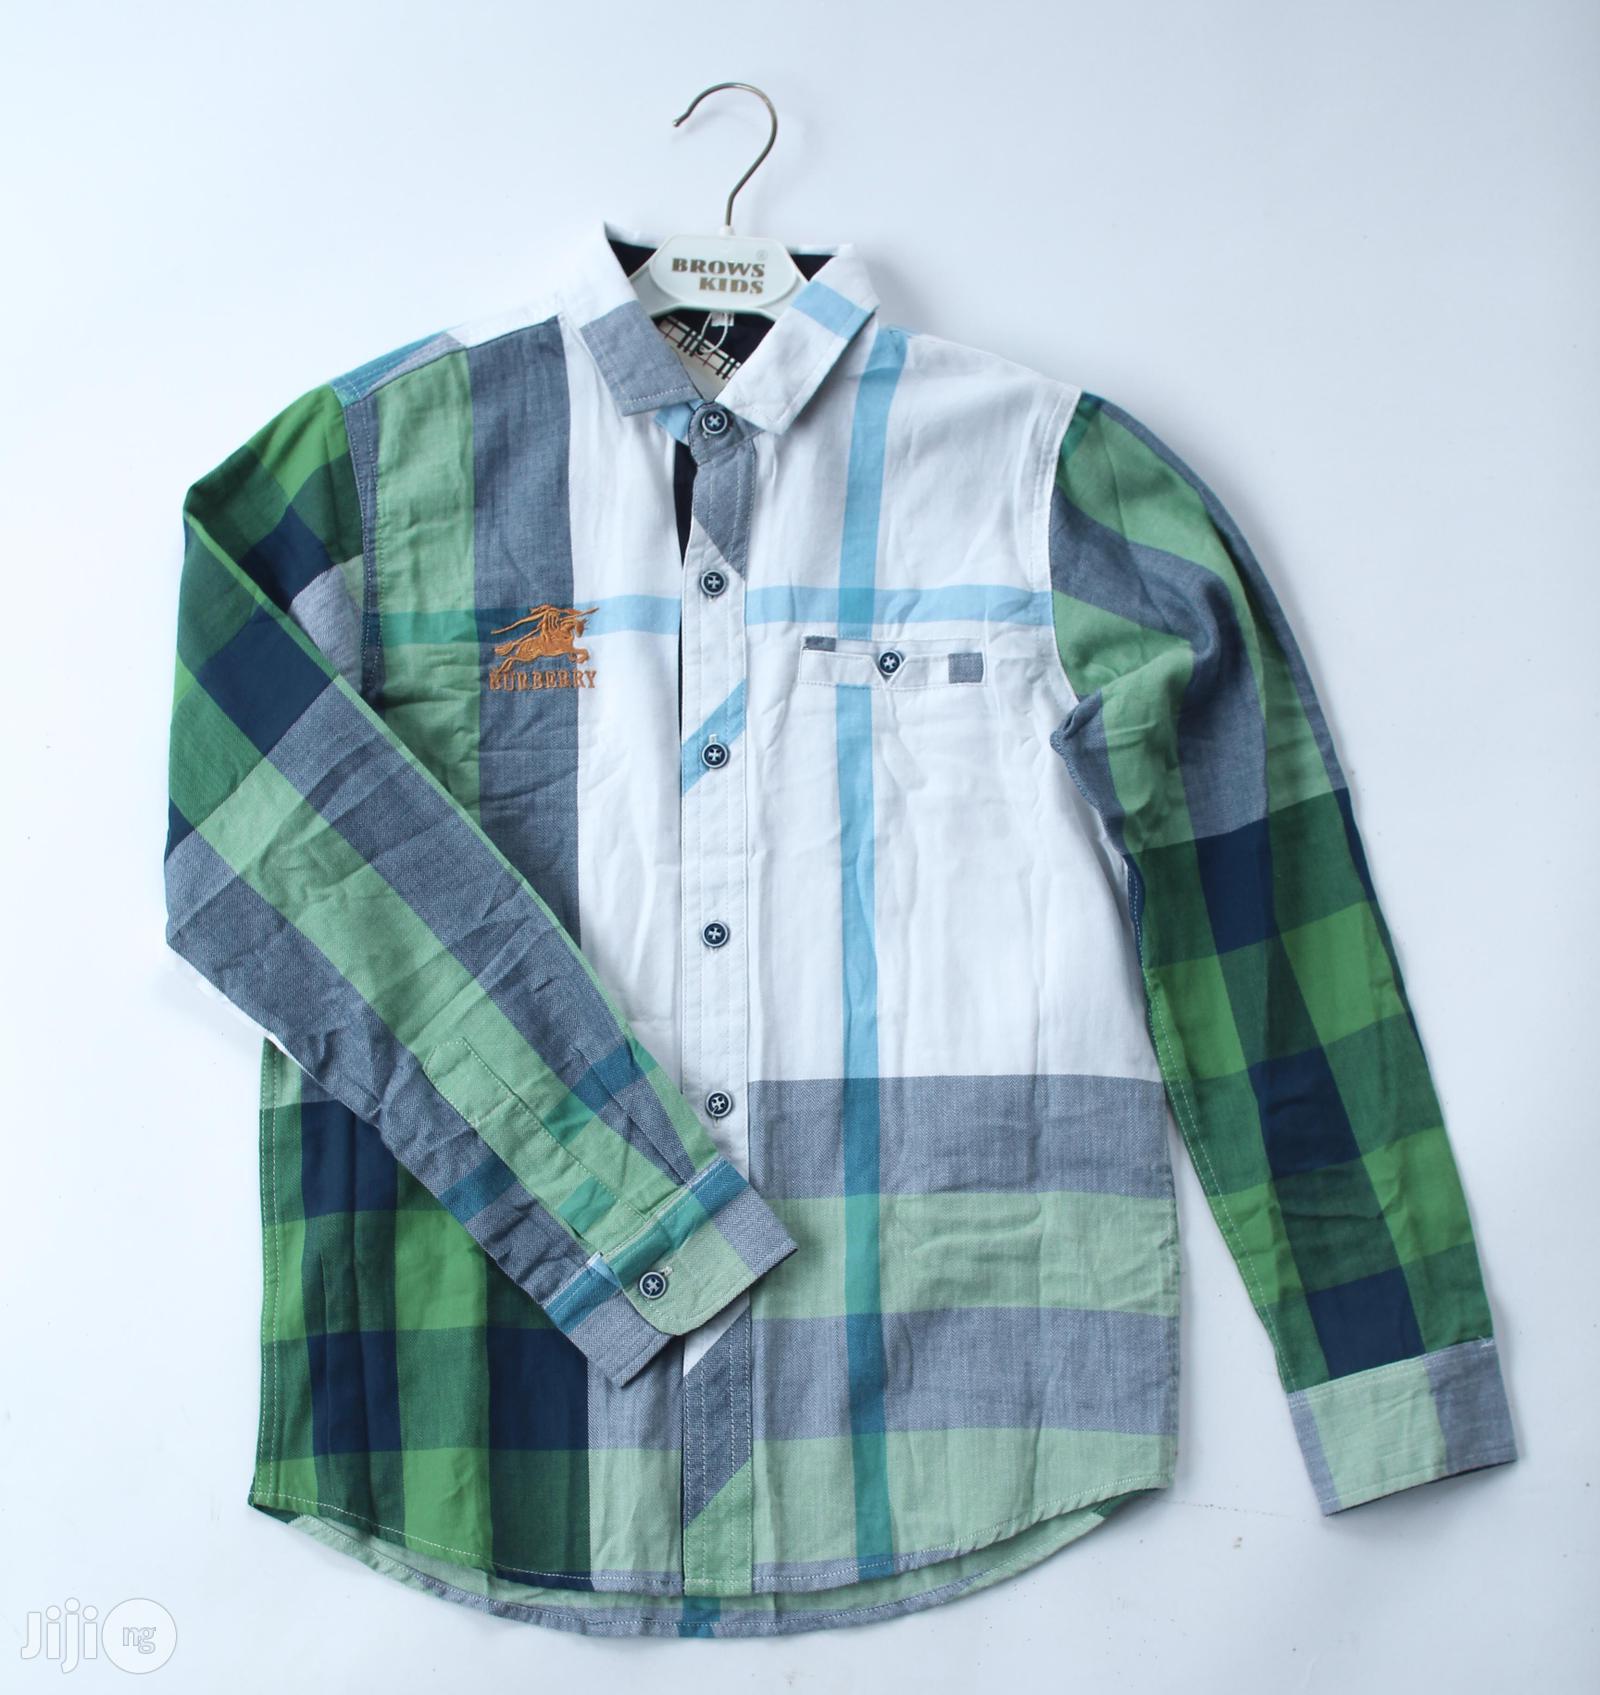 Burberry Boys Shirt.